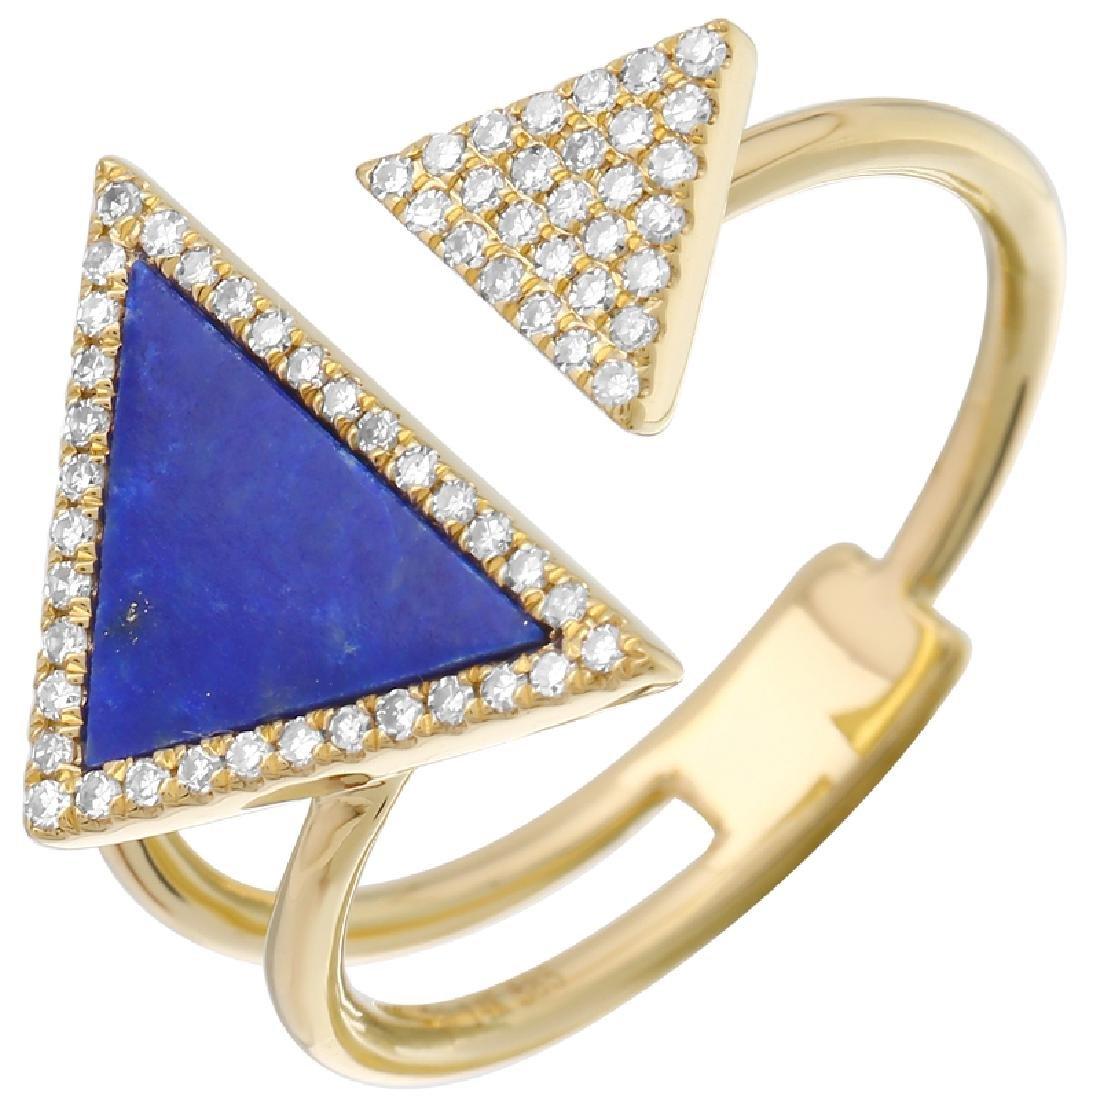 14KT Yellow Gold Gemstone Ring - 2